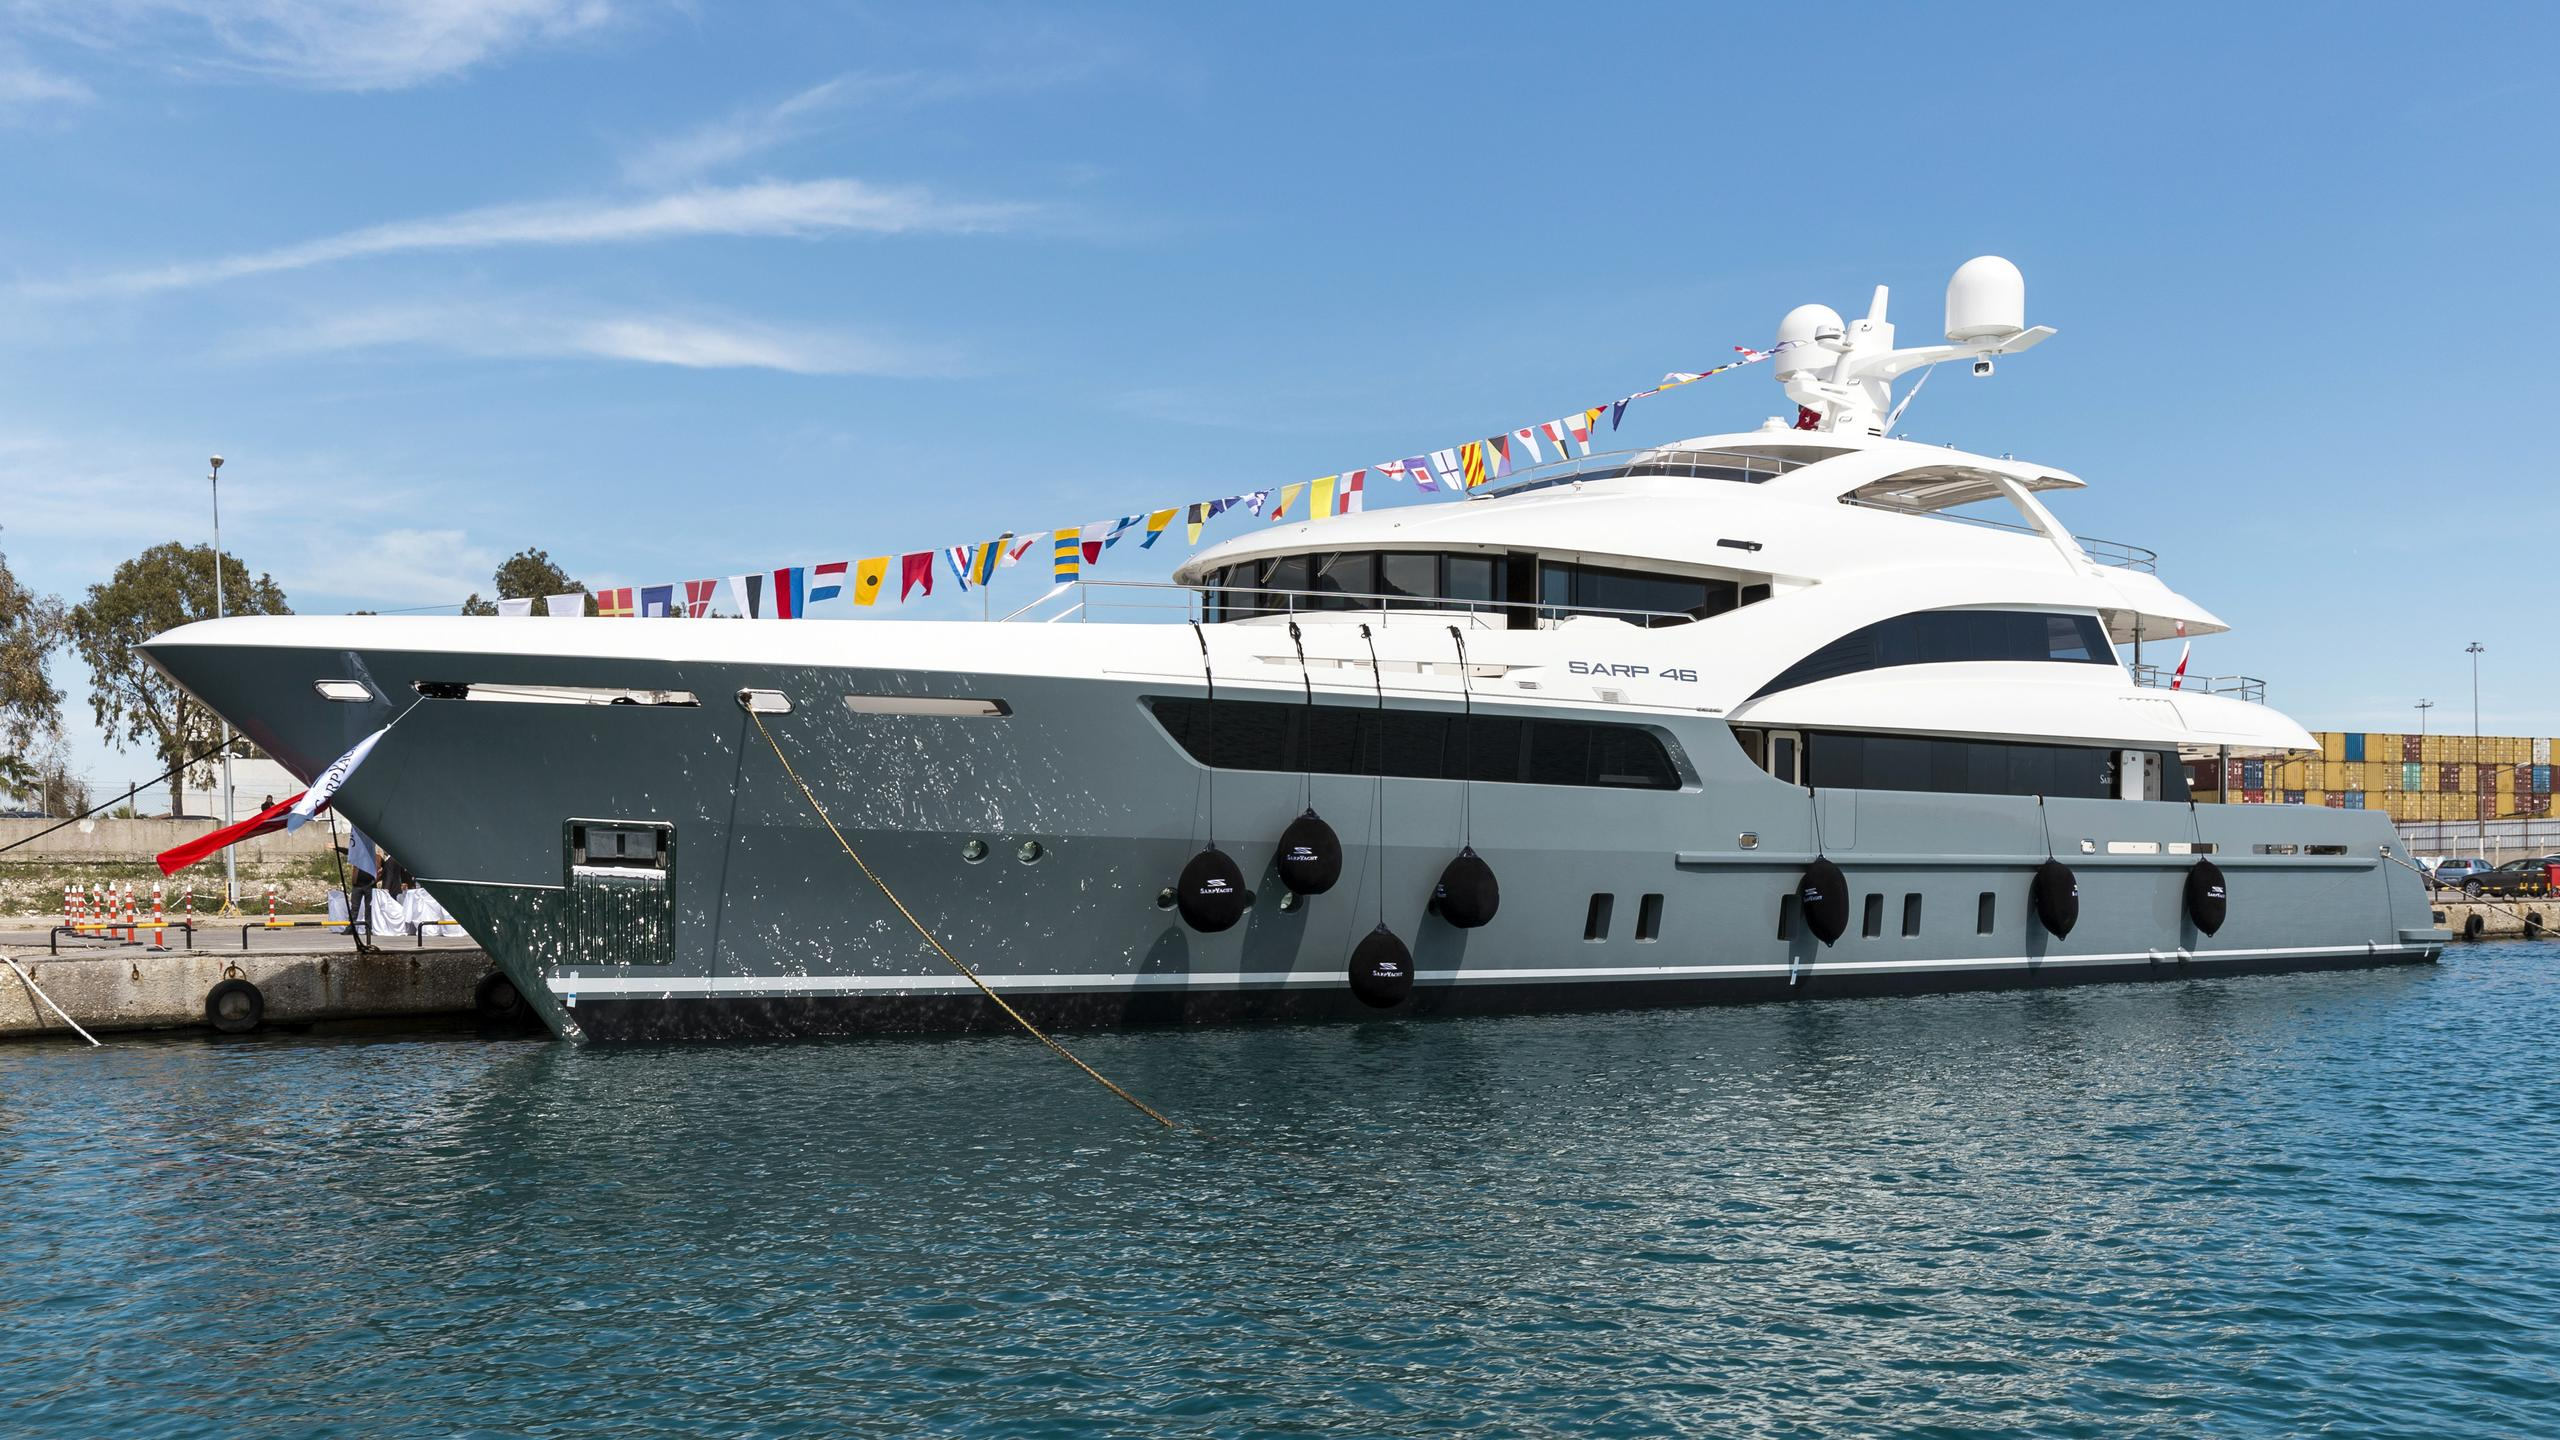 sarp-46-motor-yacht-2016-profile